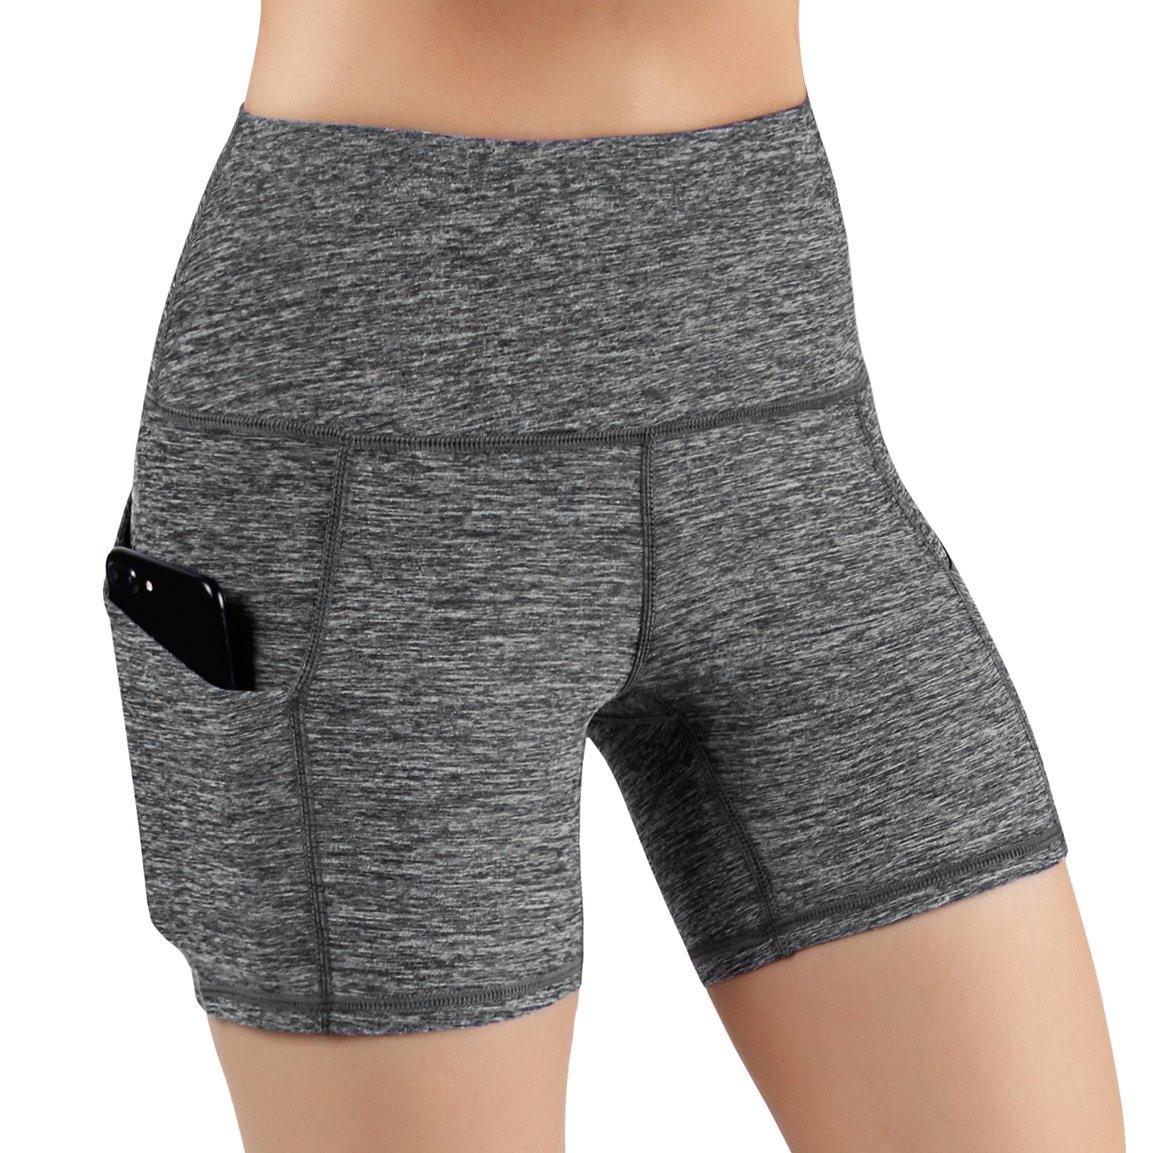 ODODOS High Waist Out Pocket Yoga Short Tummy Control Workout Running Athletic Non See-Through Yoga Shorts,GrayHeather,X-Small